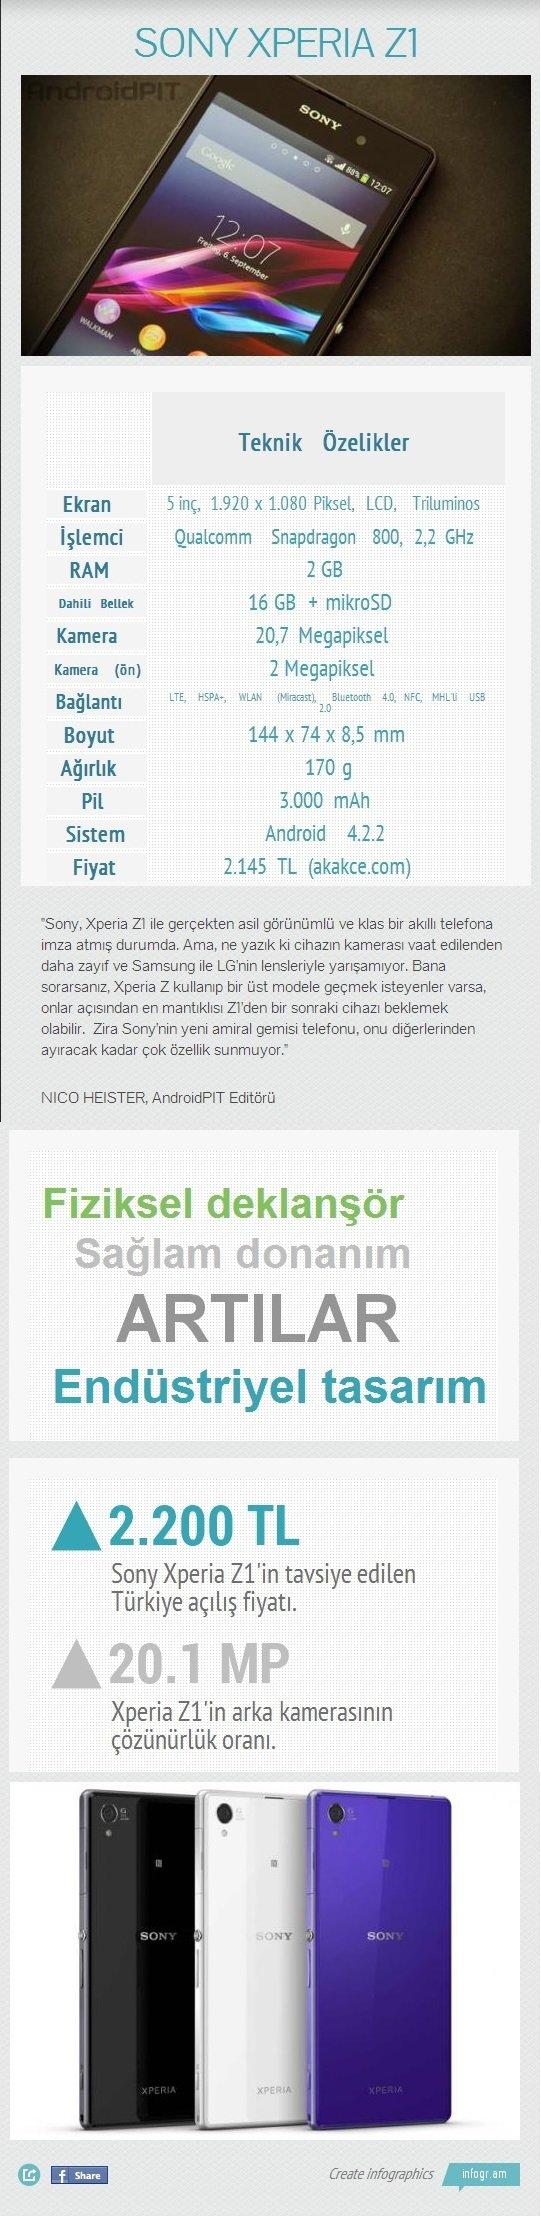 xperia z1 infographic